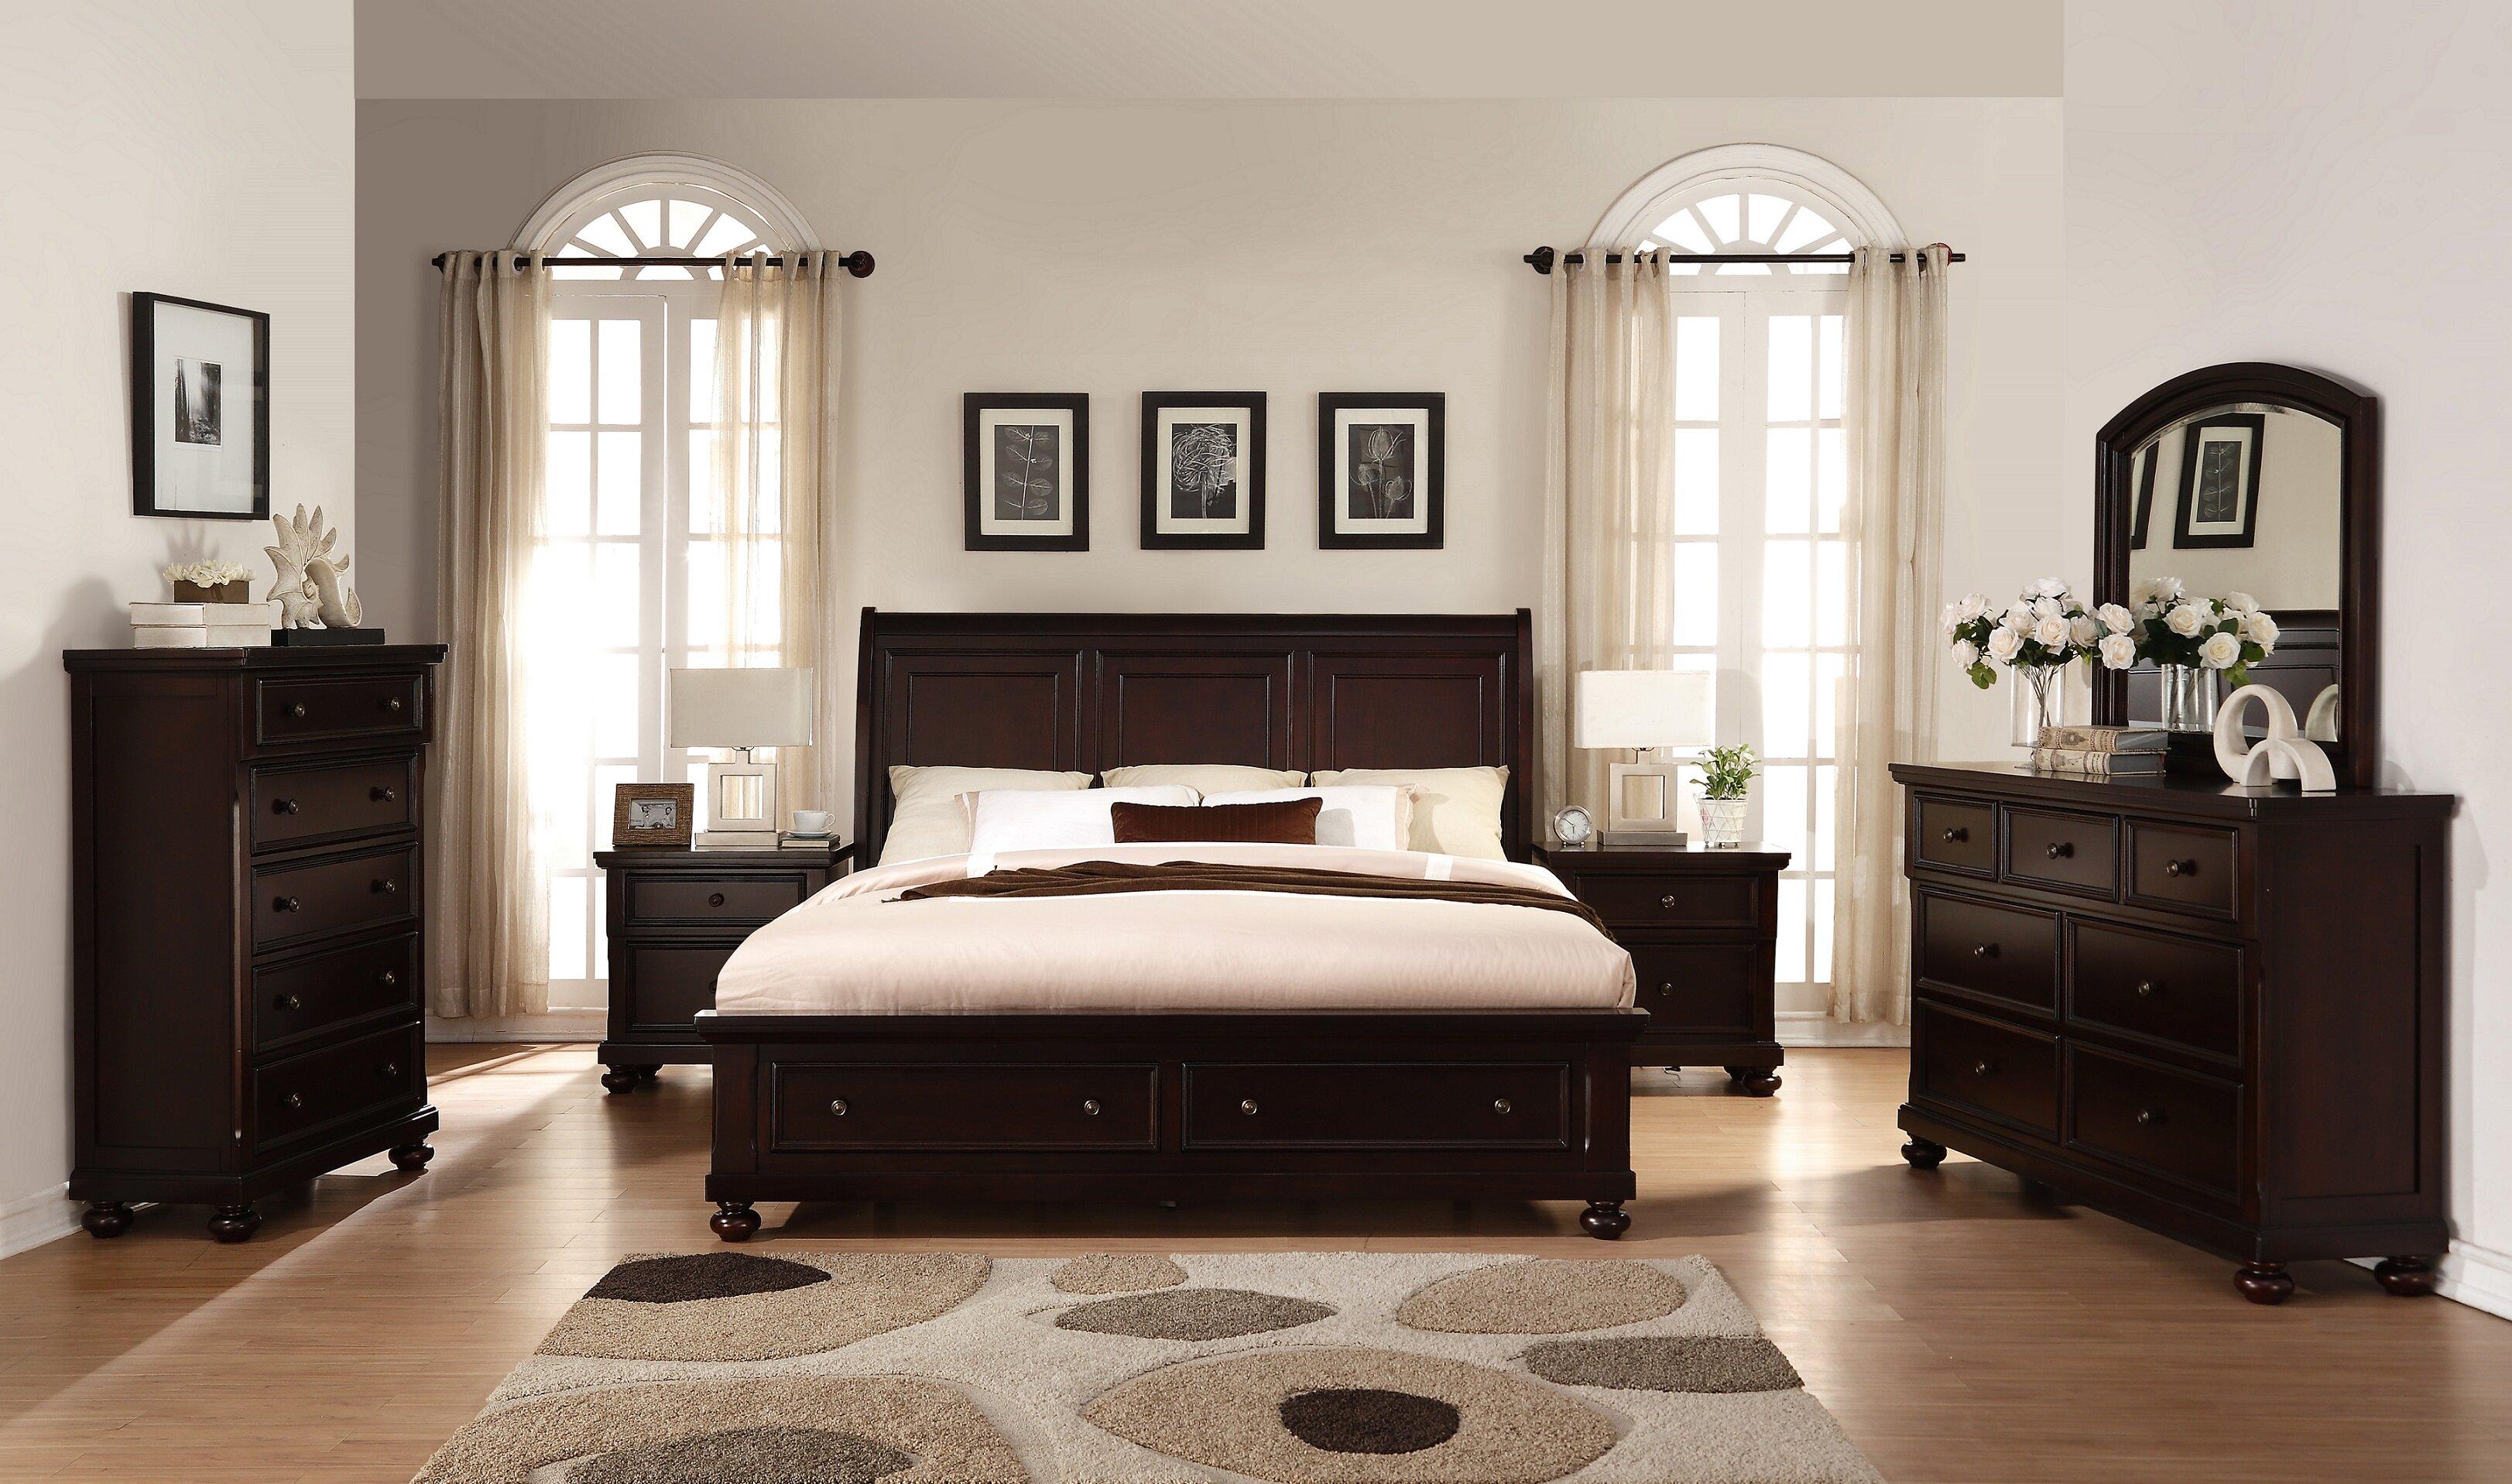 Breakwater Bay Jaimes King Platform Solid Wood 6 Piece Bedroom Set